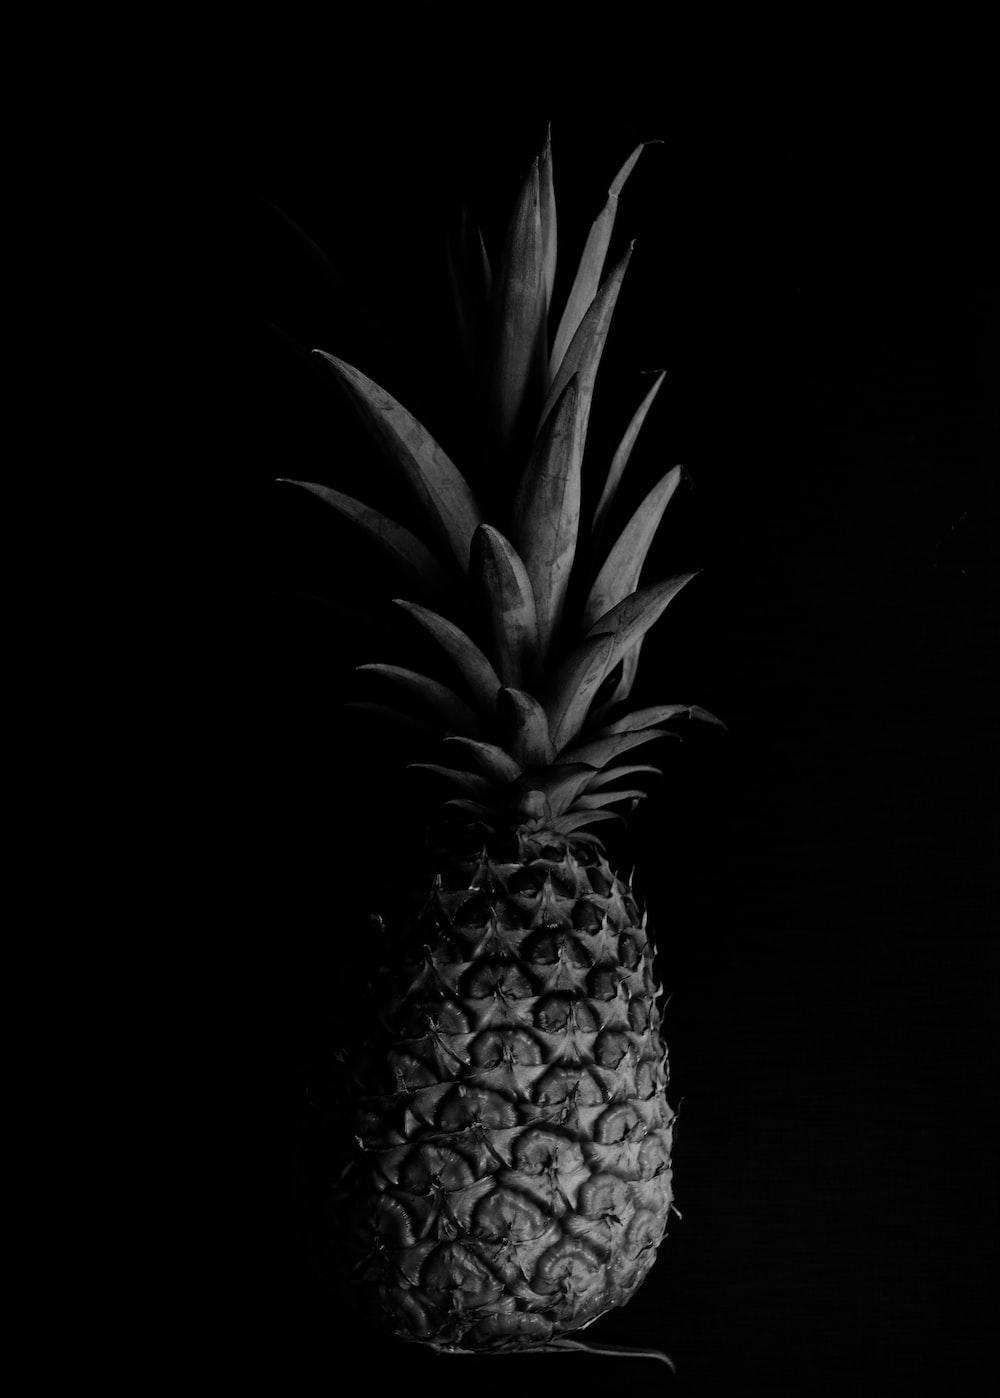 pineapple fruit on black background